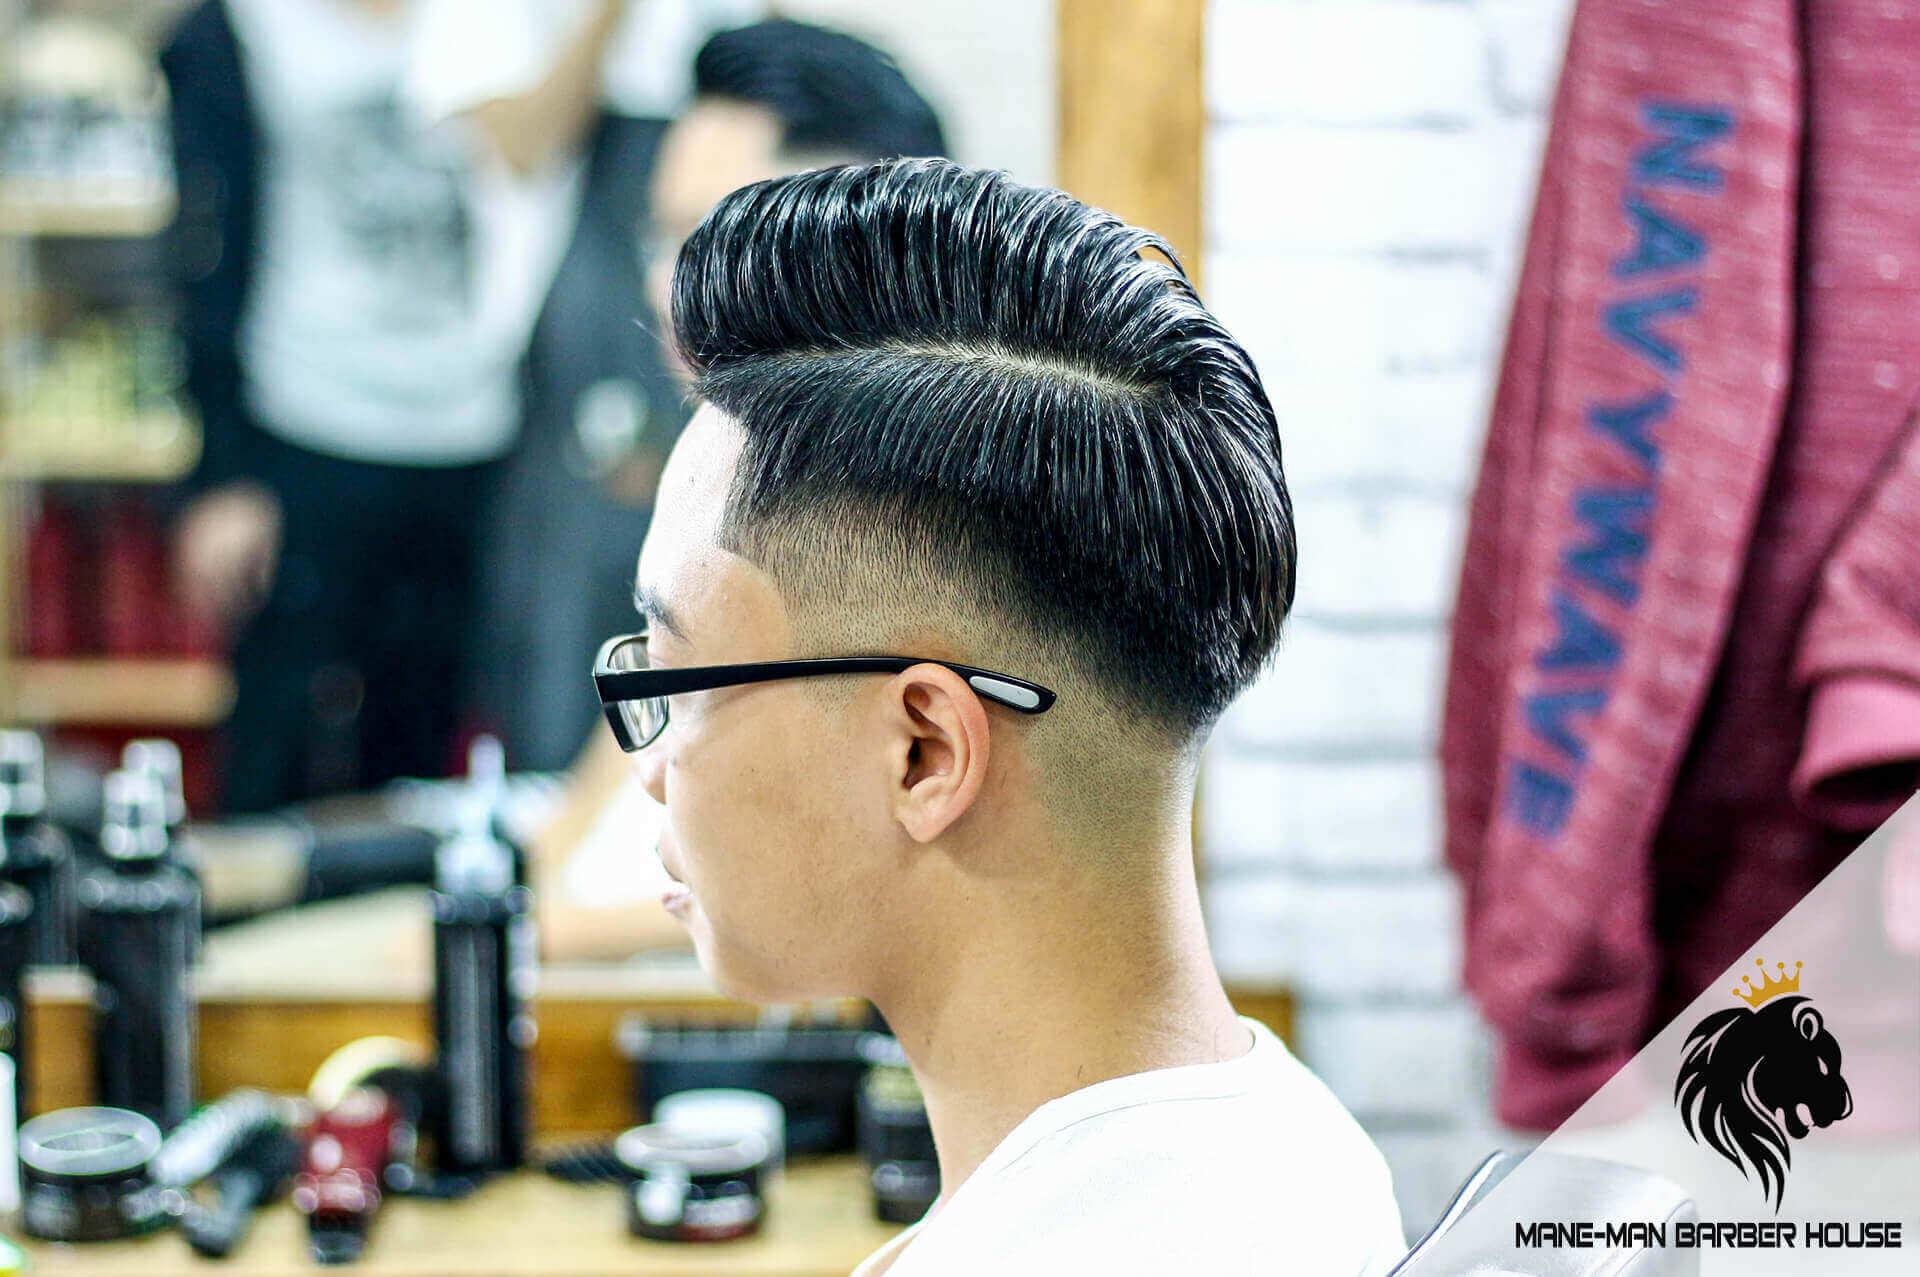 Kiểu tóc Pompadour ngắn